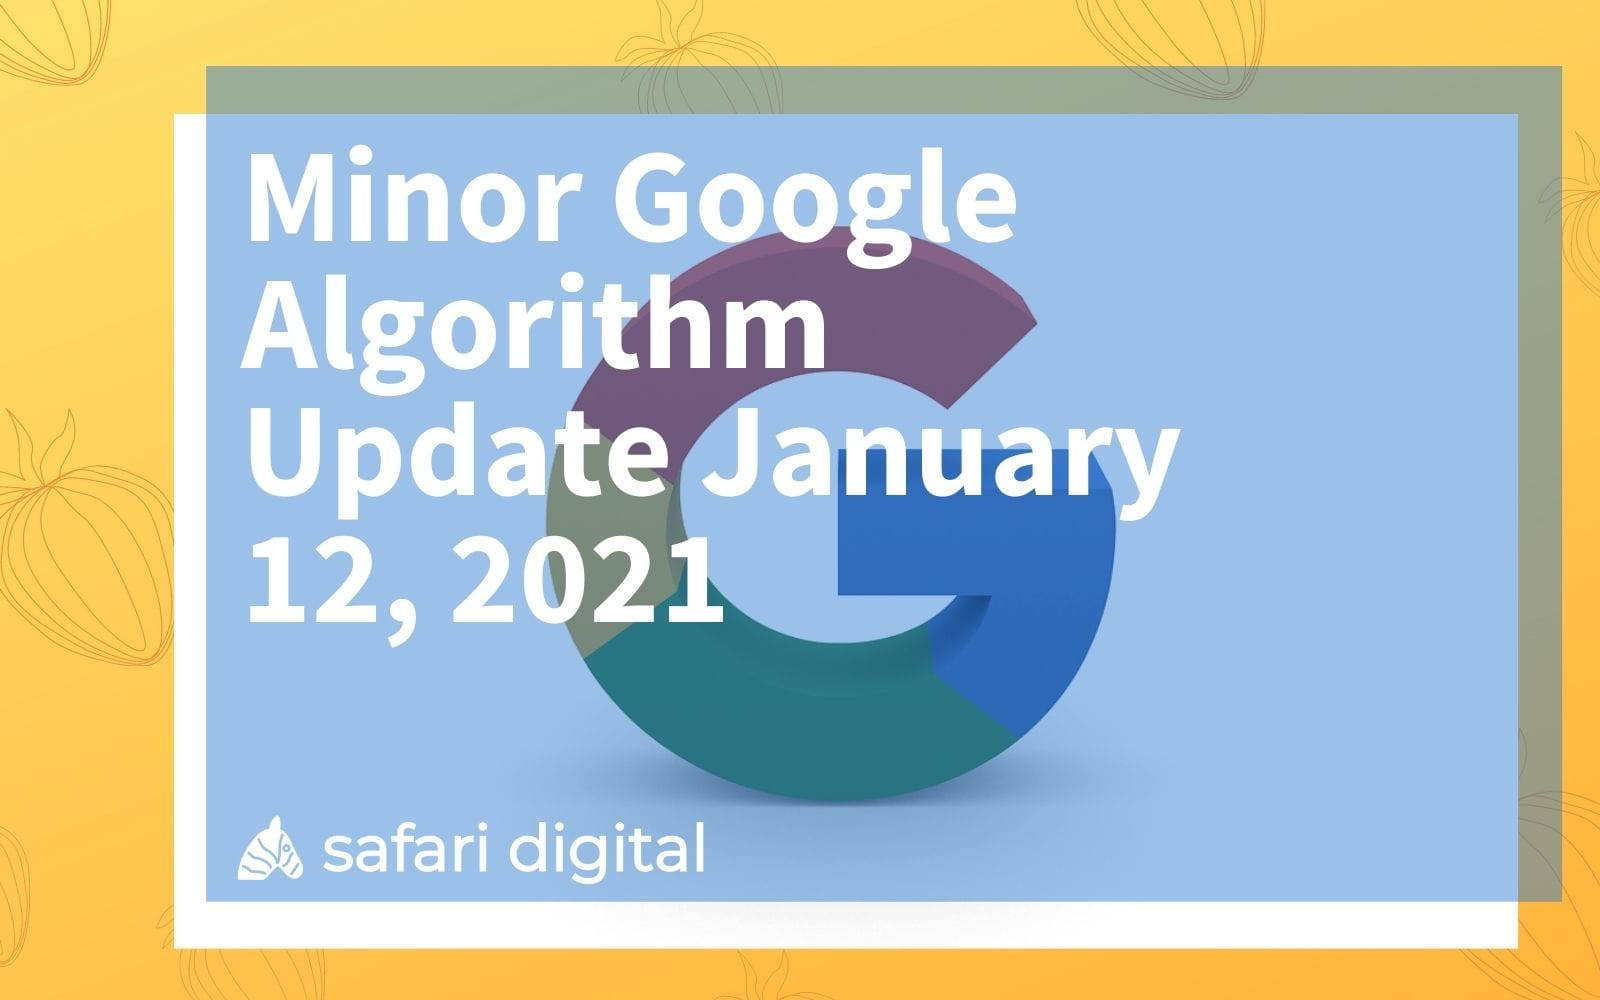 minor google algorithm update january 2021